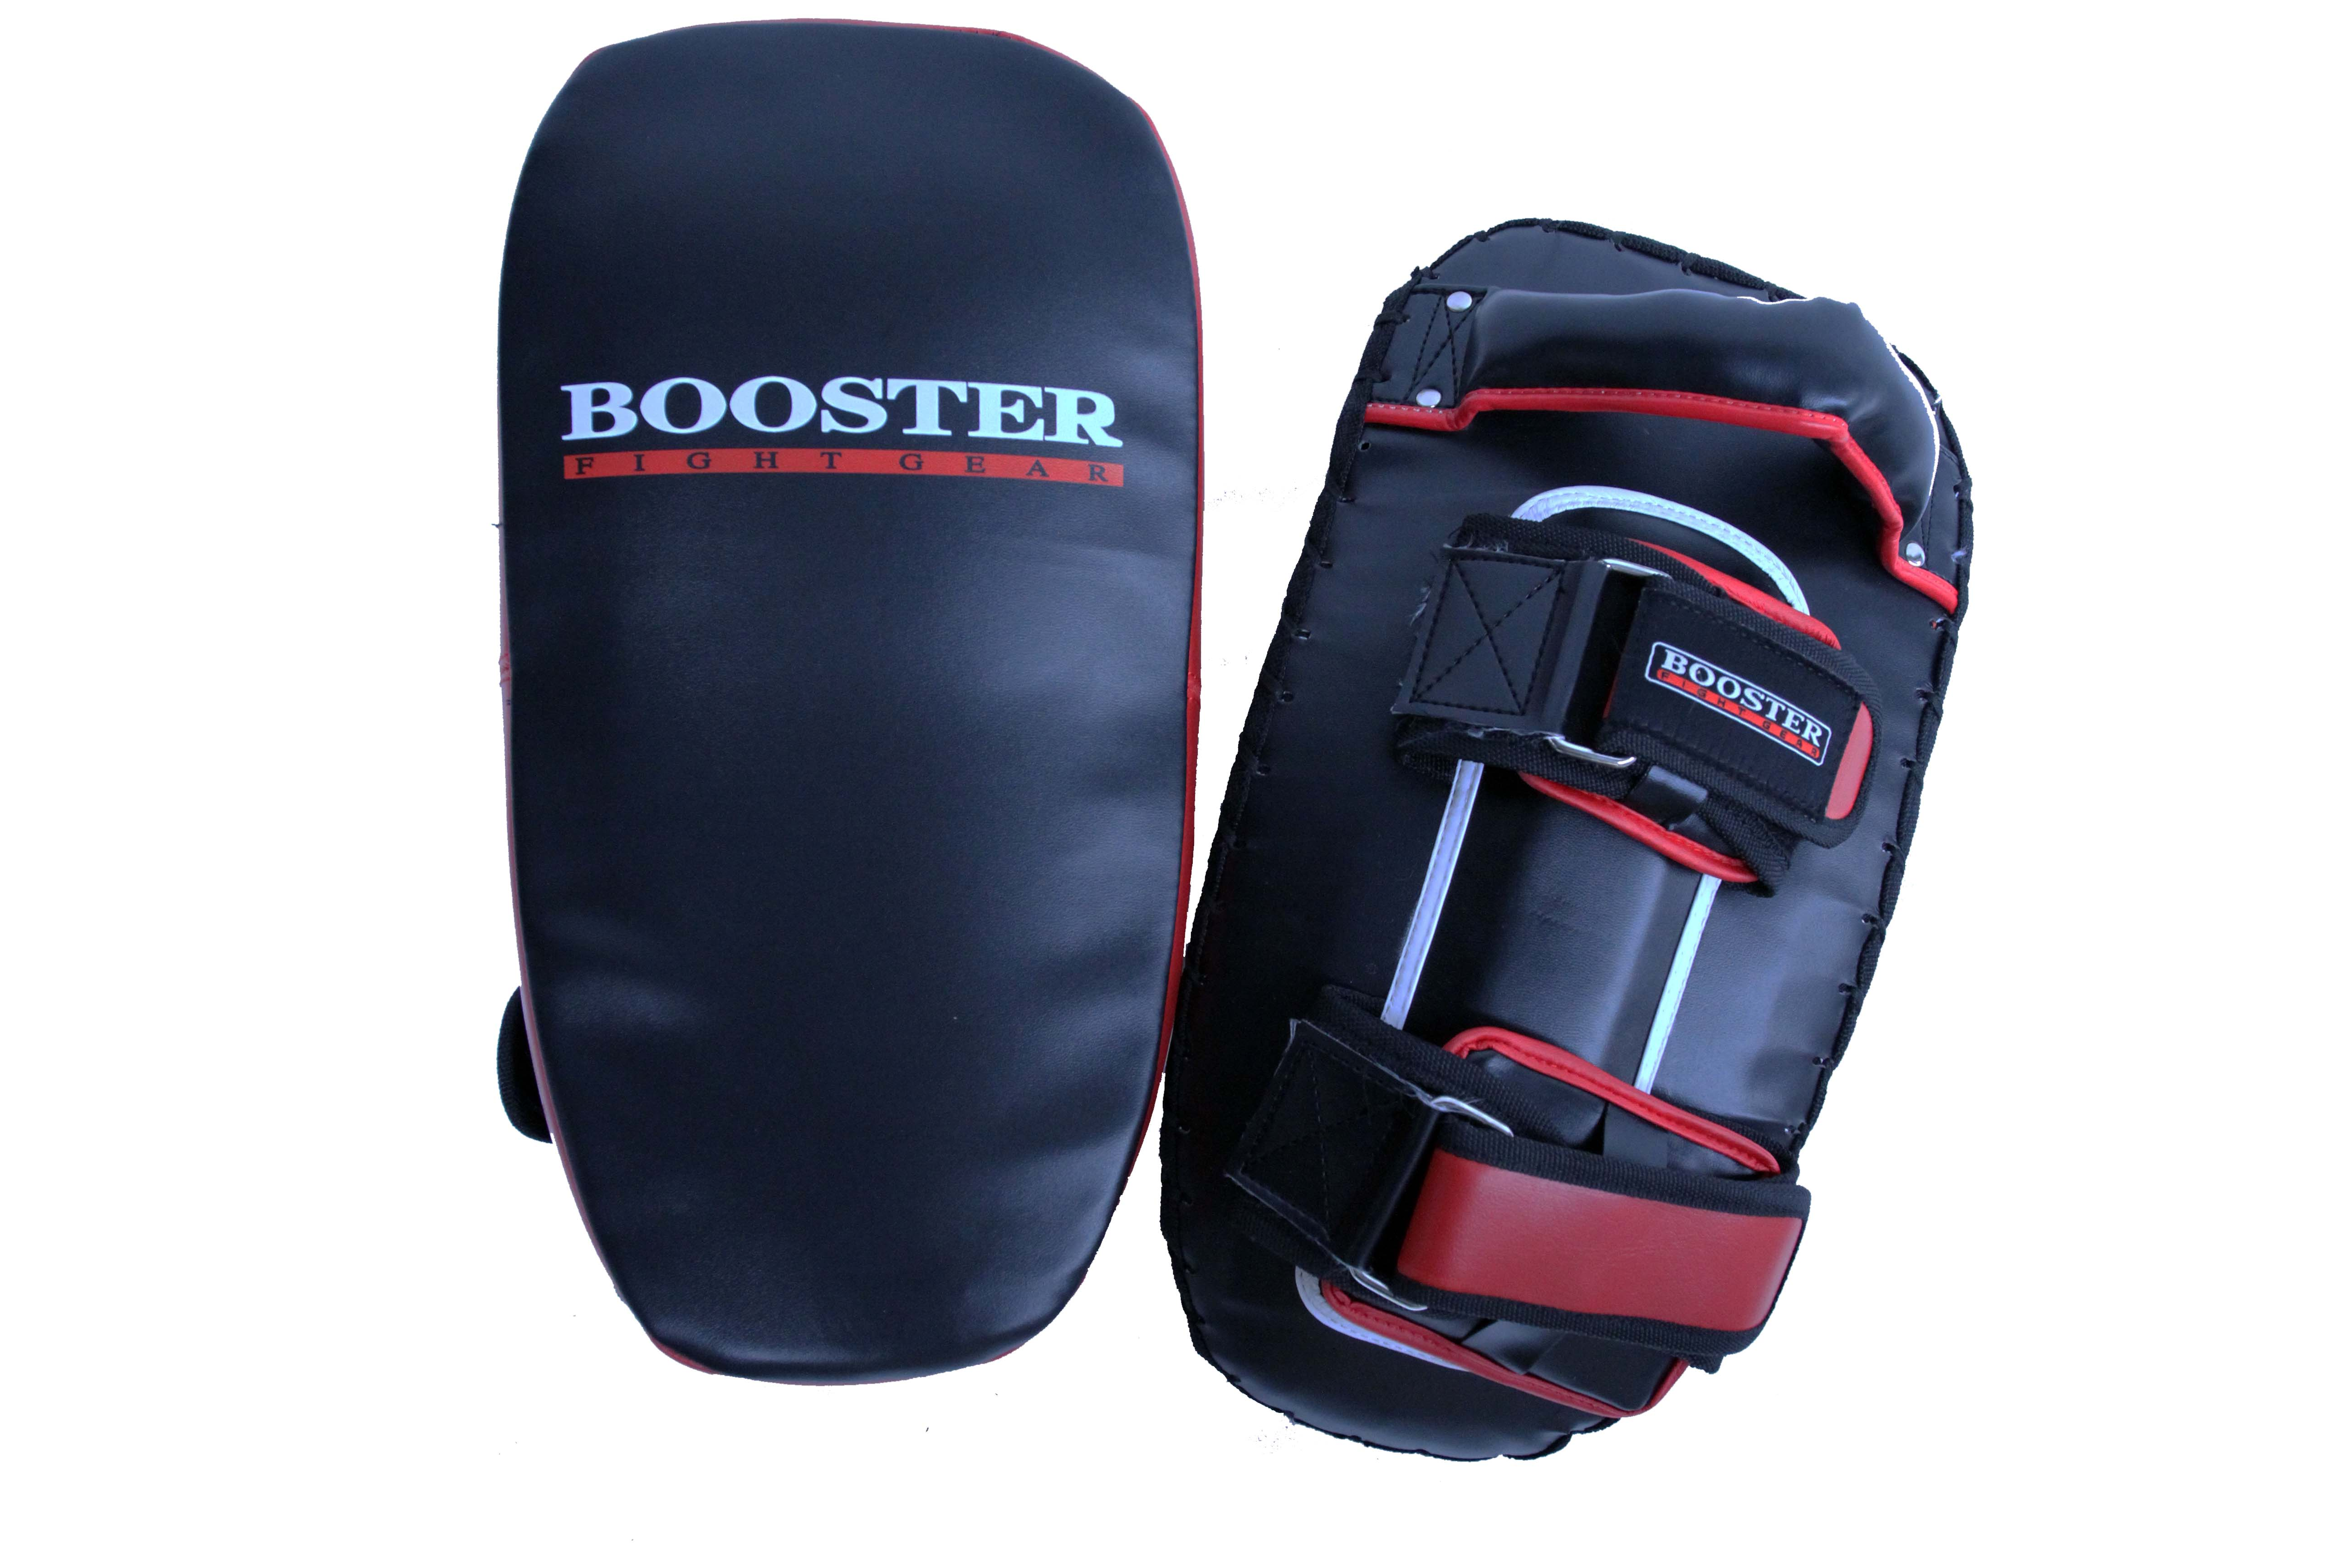 Booster Armpads